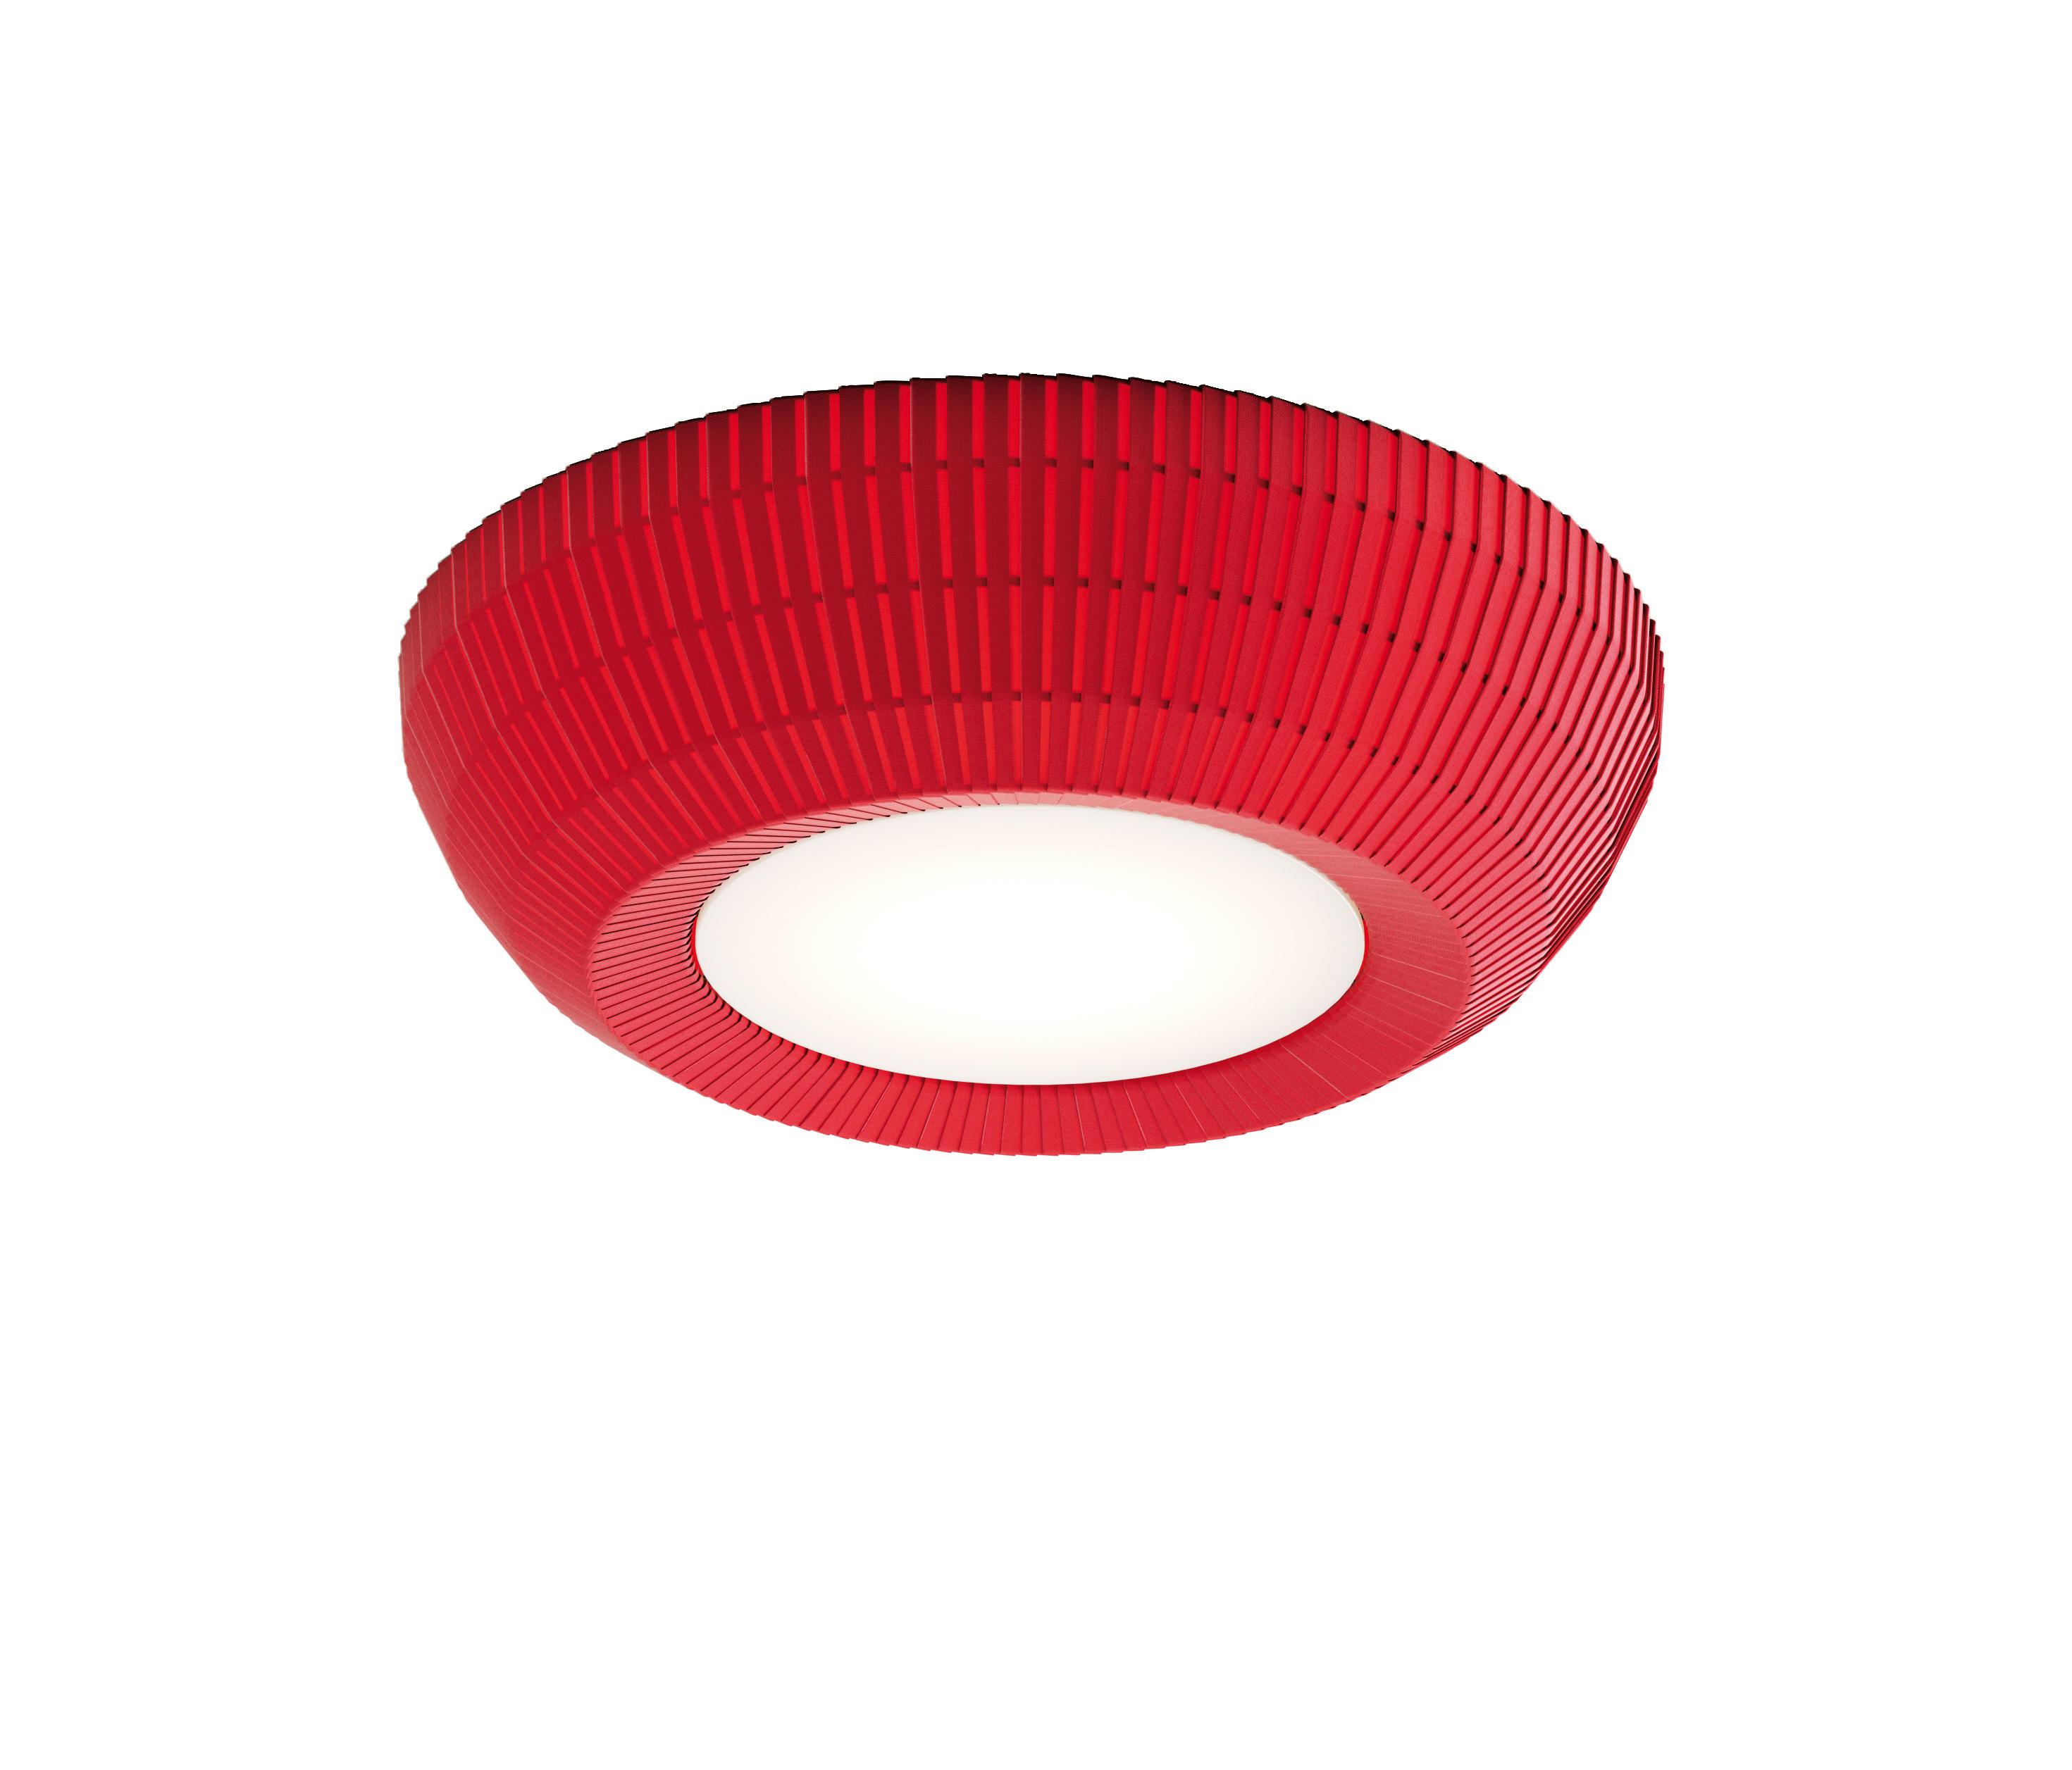 designer deckenleuchte bell 60 cm axo light dslampen. Black Bedroom Furniture Sets. Home Design Ideas